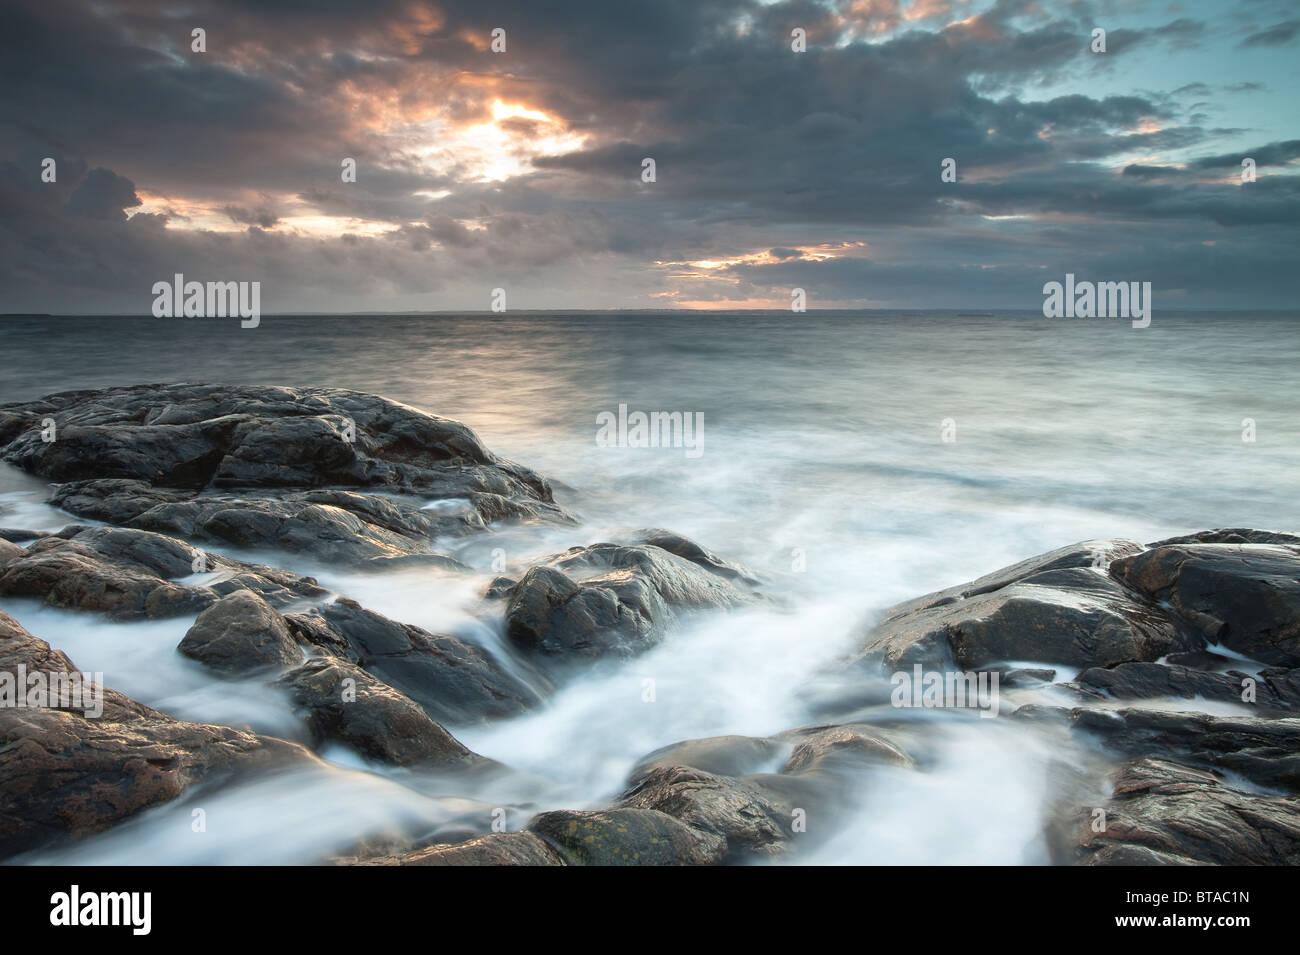 Coastal landscape at Larkollen in Rygge kommune, Østfold fylke, Norway. - Stock Image